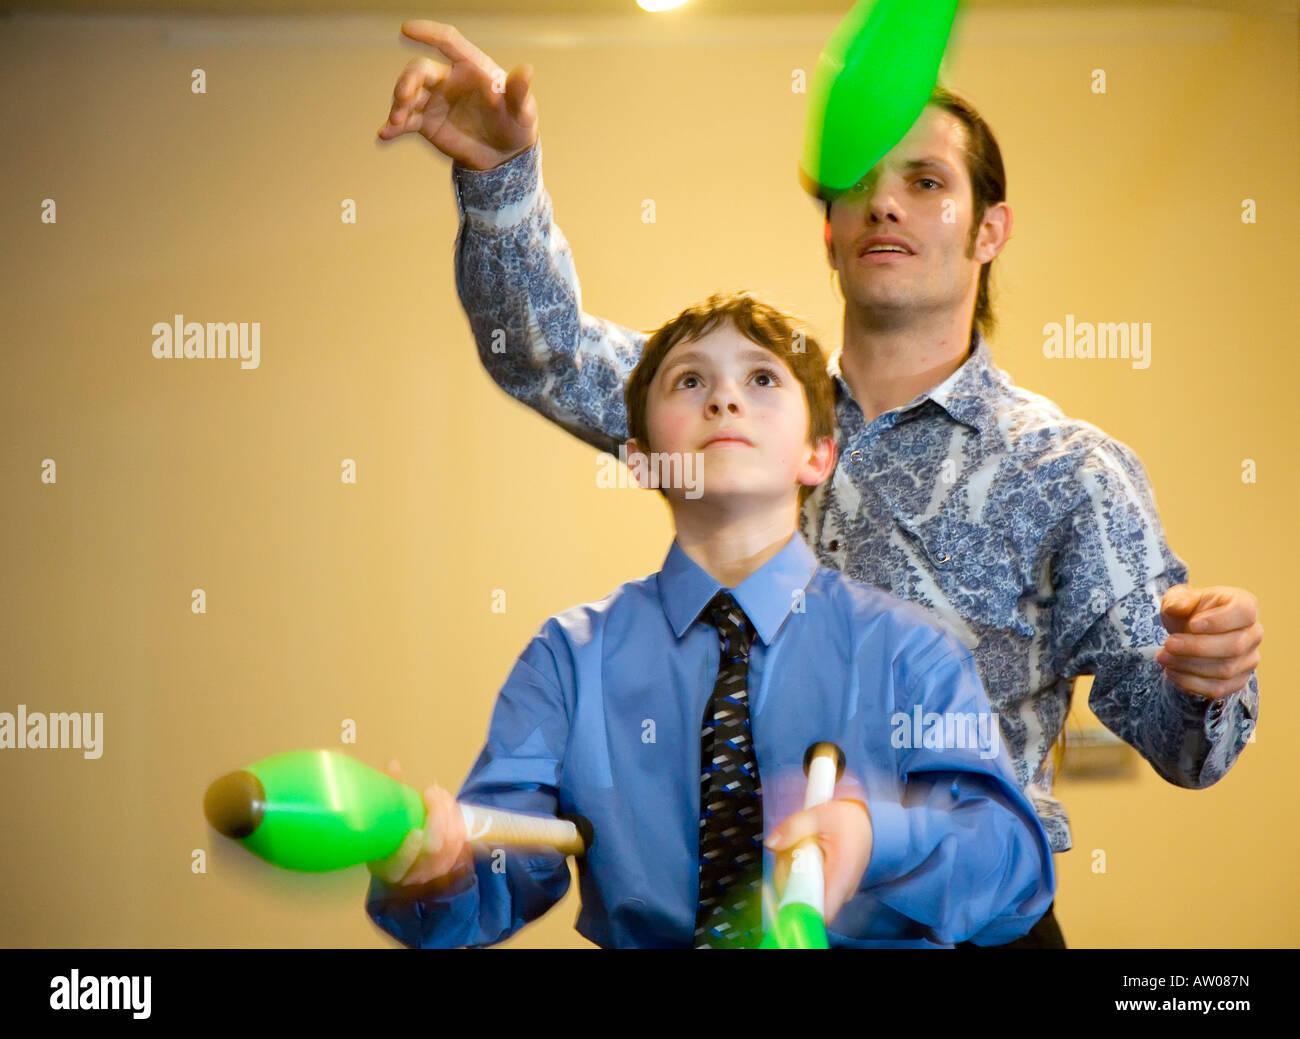 Farmington Hills Michigan Justin Finkel 13 juggles as his teacher stands behind him - Stock Image